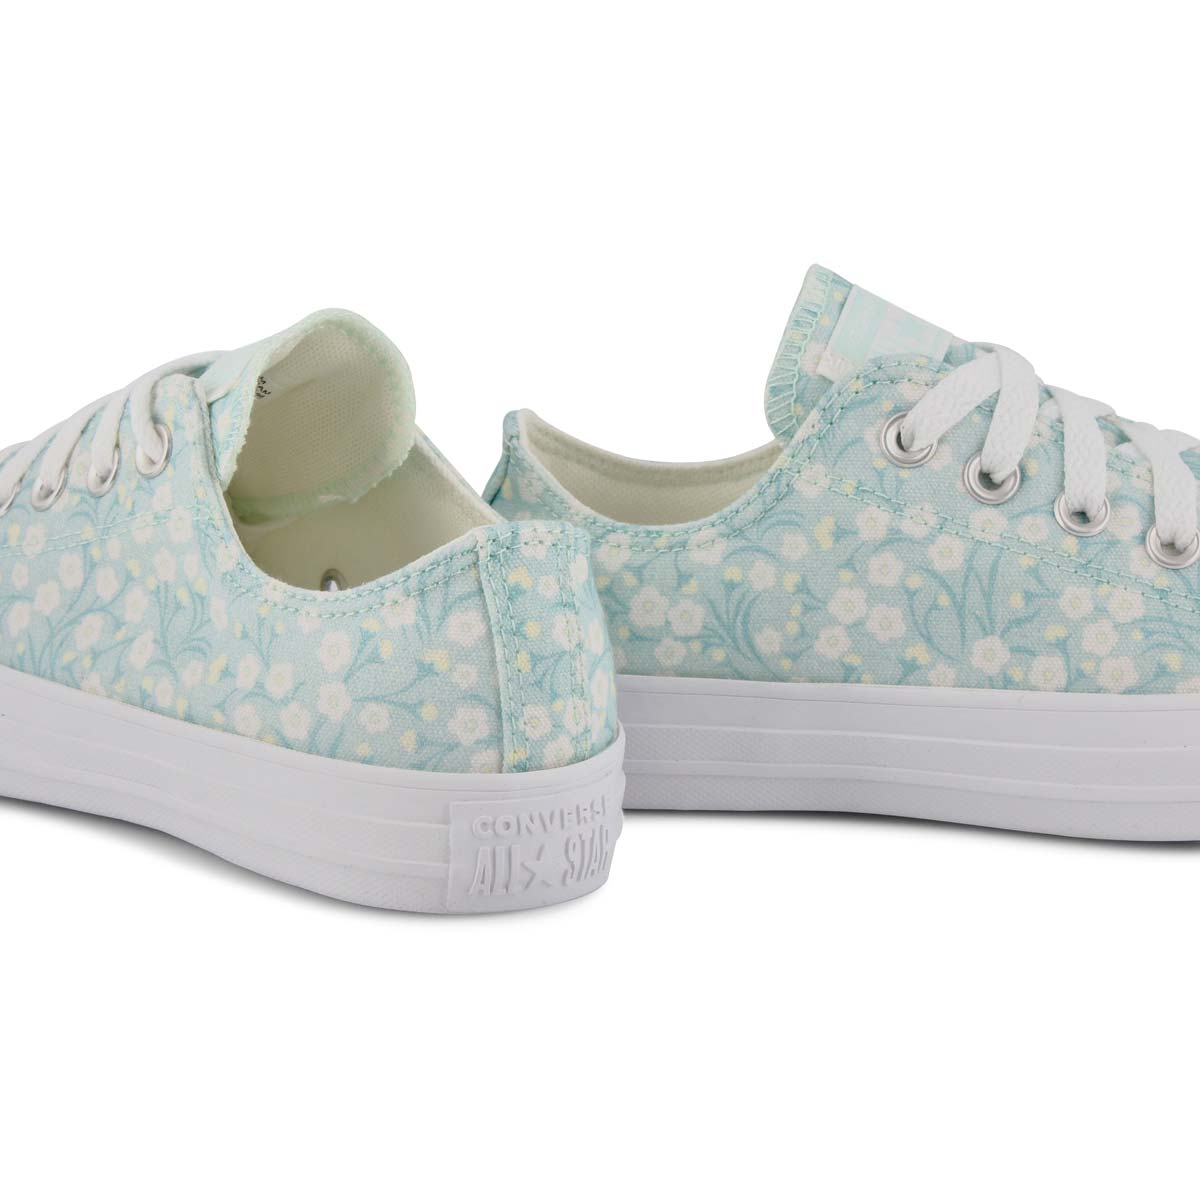 Women's All Star Ditsy Floral Sneaker - Mint